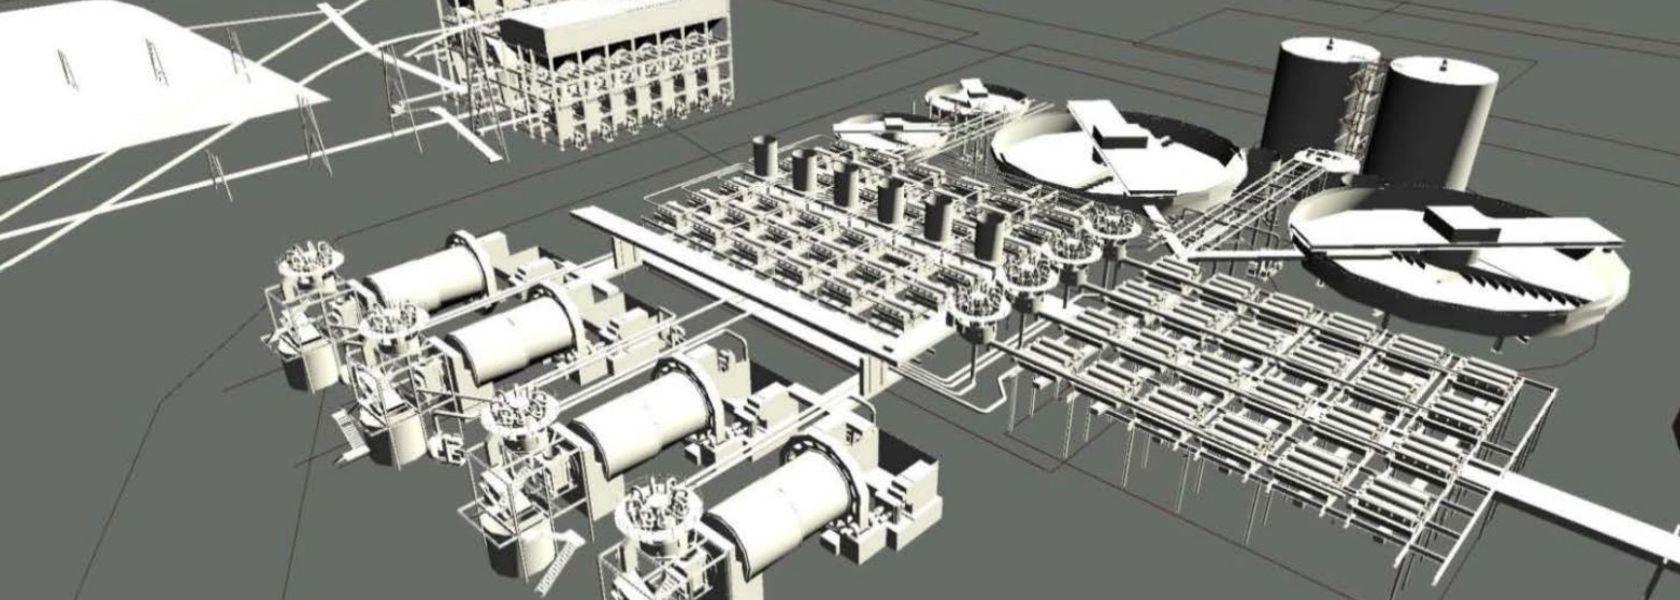 Hawsons gains major project status - MiningMonthly.com